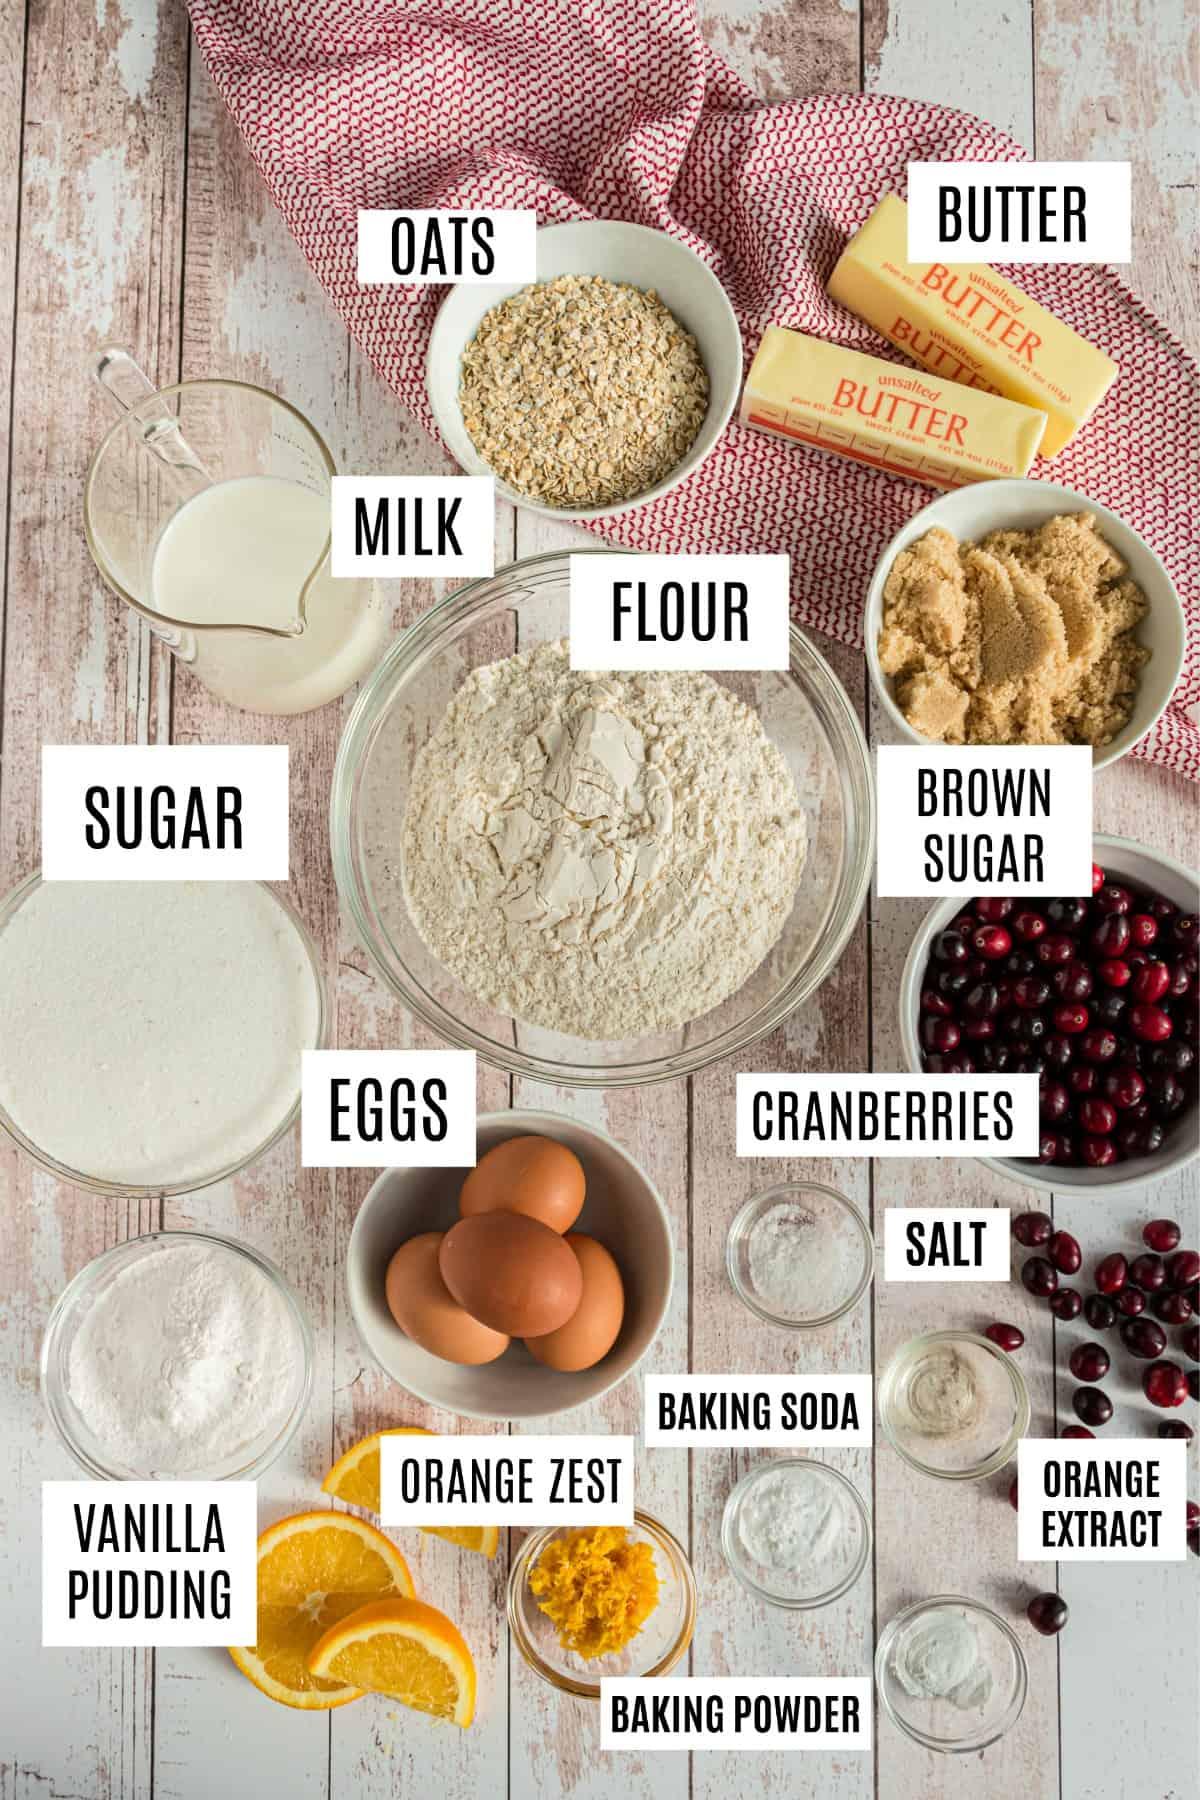 Ingredients needed to make Cranberry orange muffins.